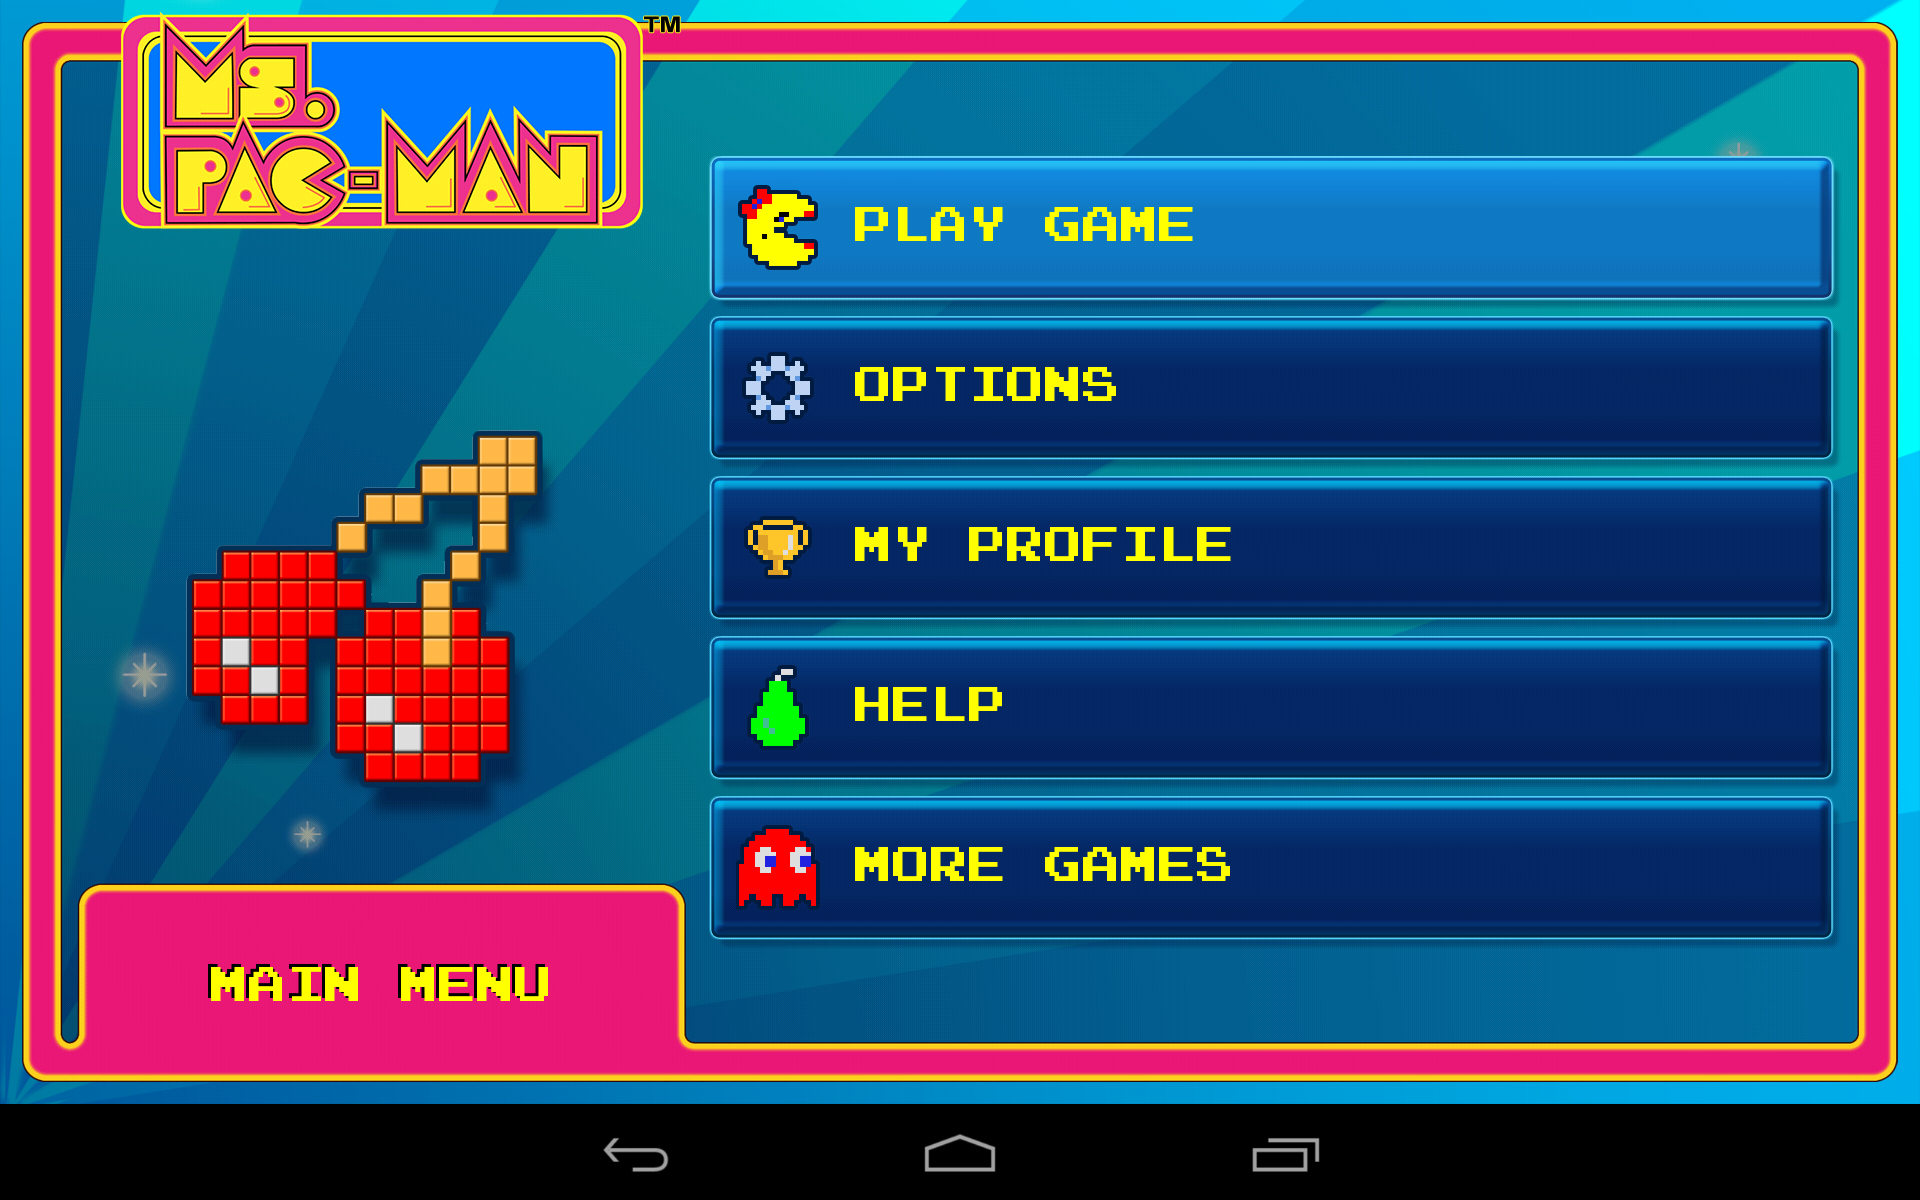 Ms. PAC-MAN by Namco screenshot #5